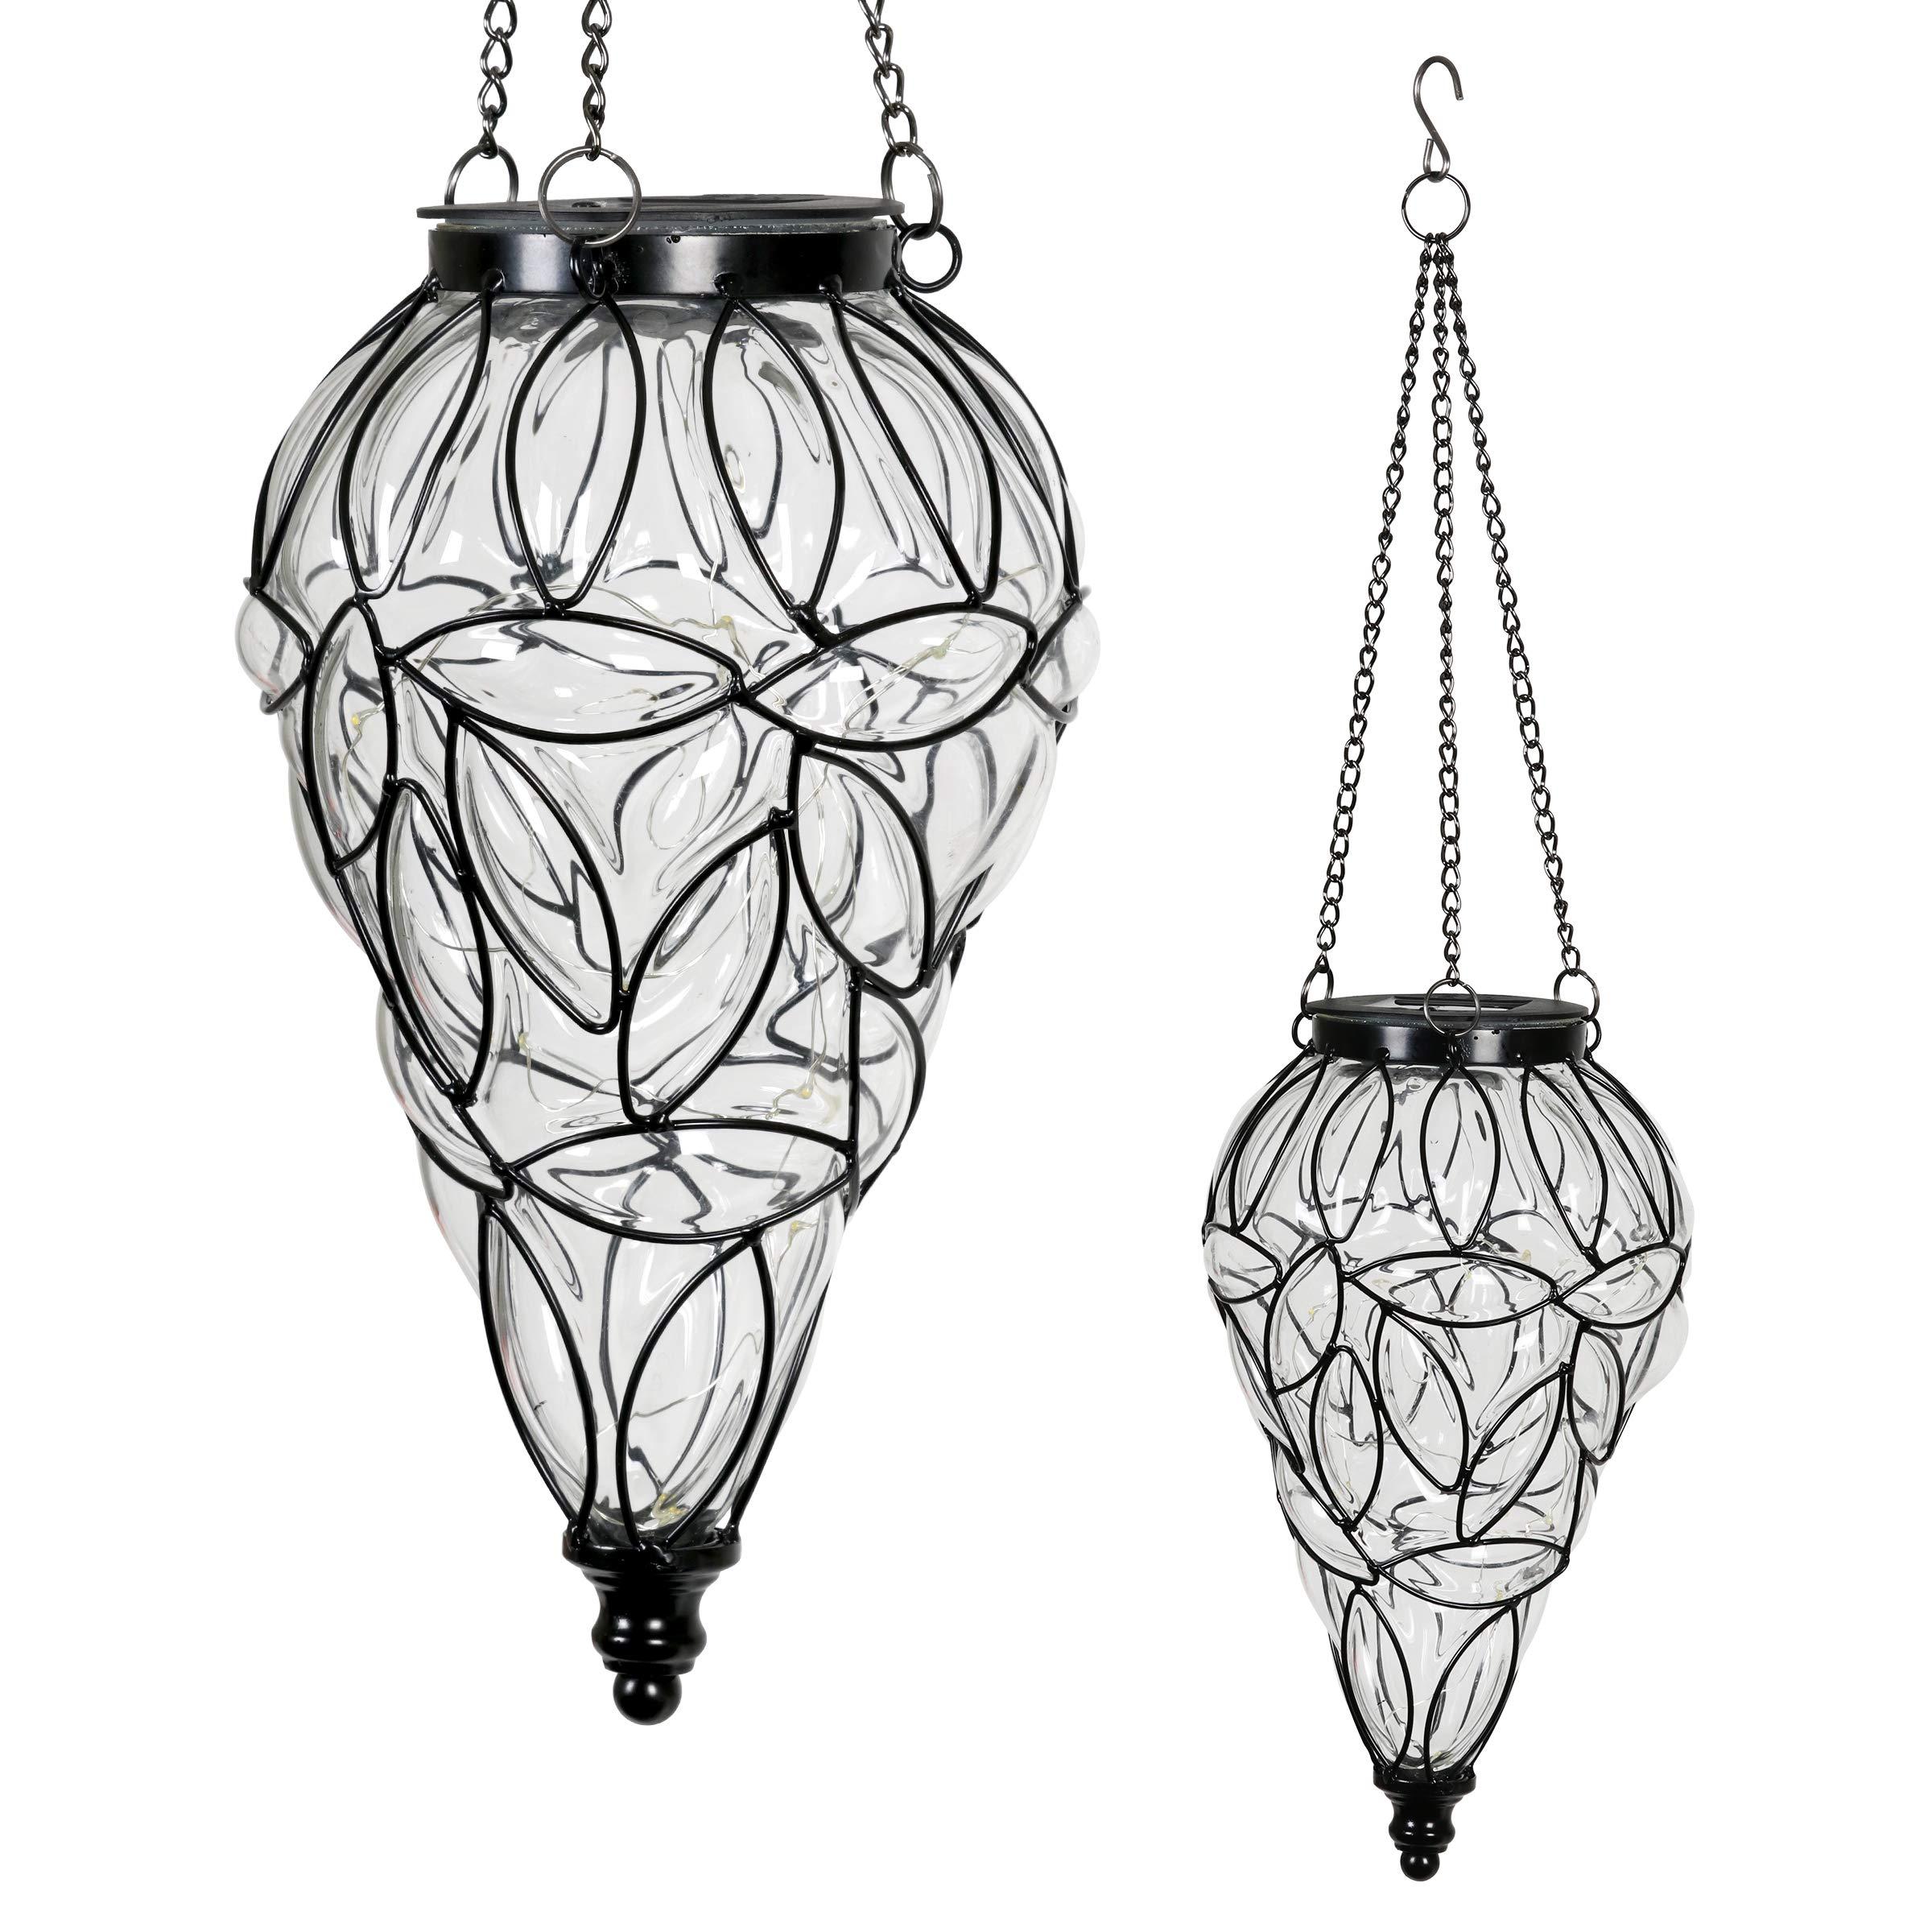 Exhart Clear Solar Lantern - Glass Tear-Shaped Hanging Lantern - Teardrop Glass Ceiling Lantern Hangs in a Metal Cage w/ 12 Blue LED Firefly Solar Lights 7'' L x 7'' W x 24'' H